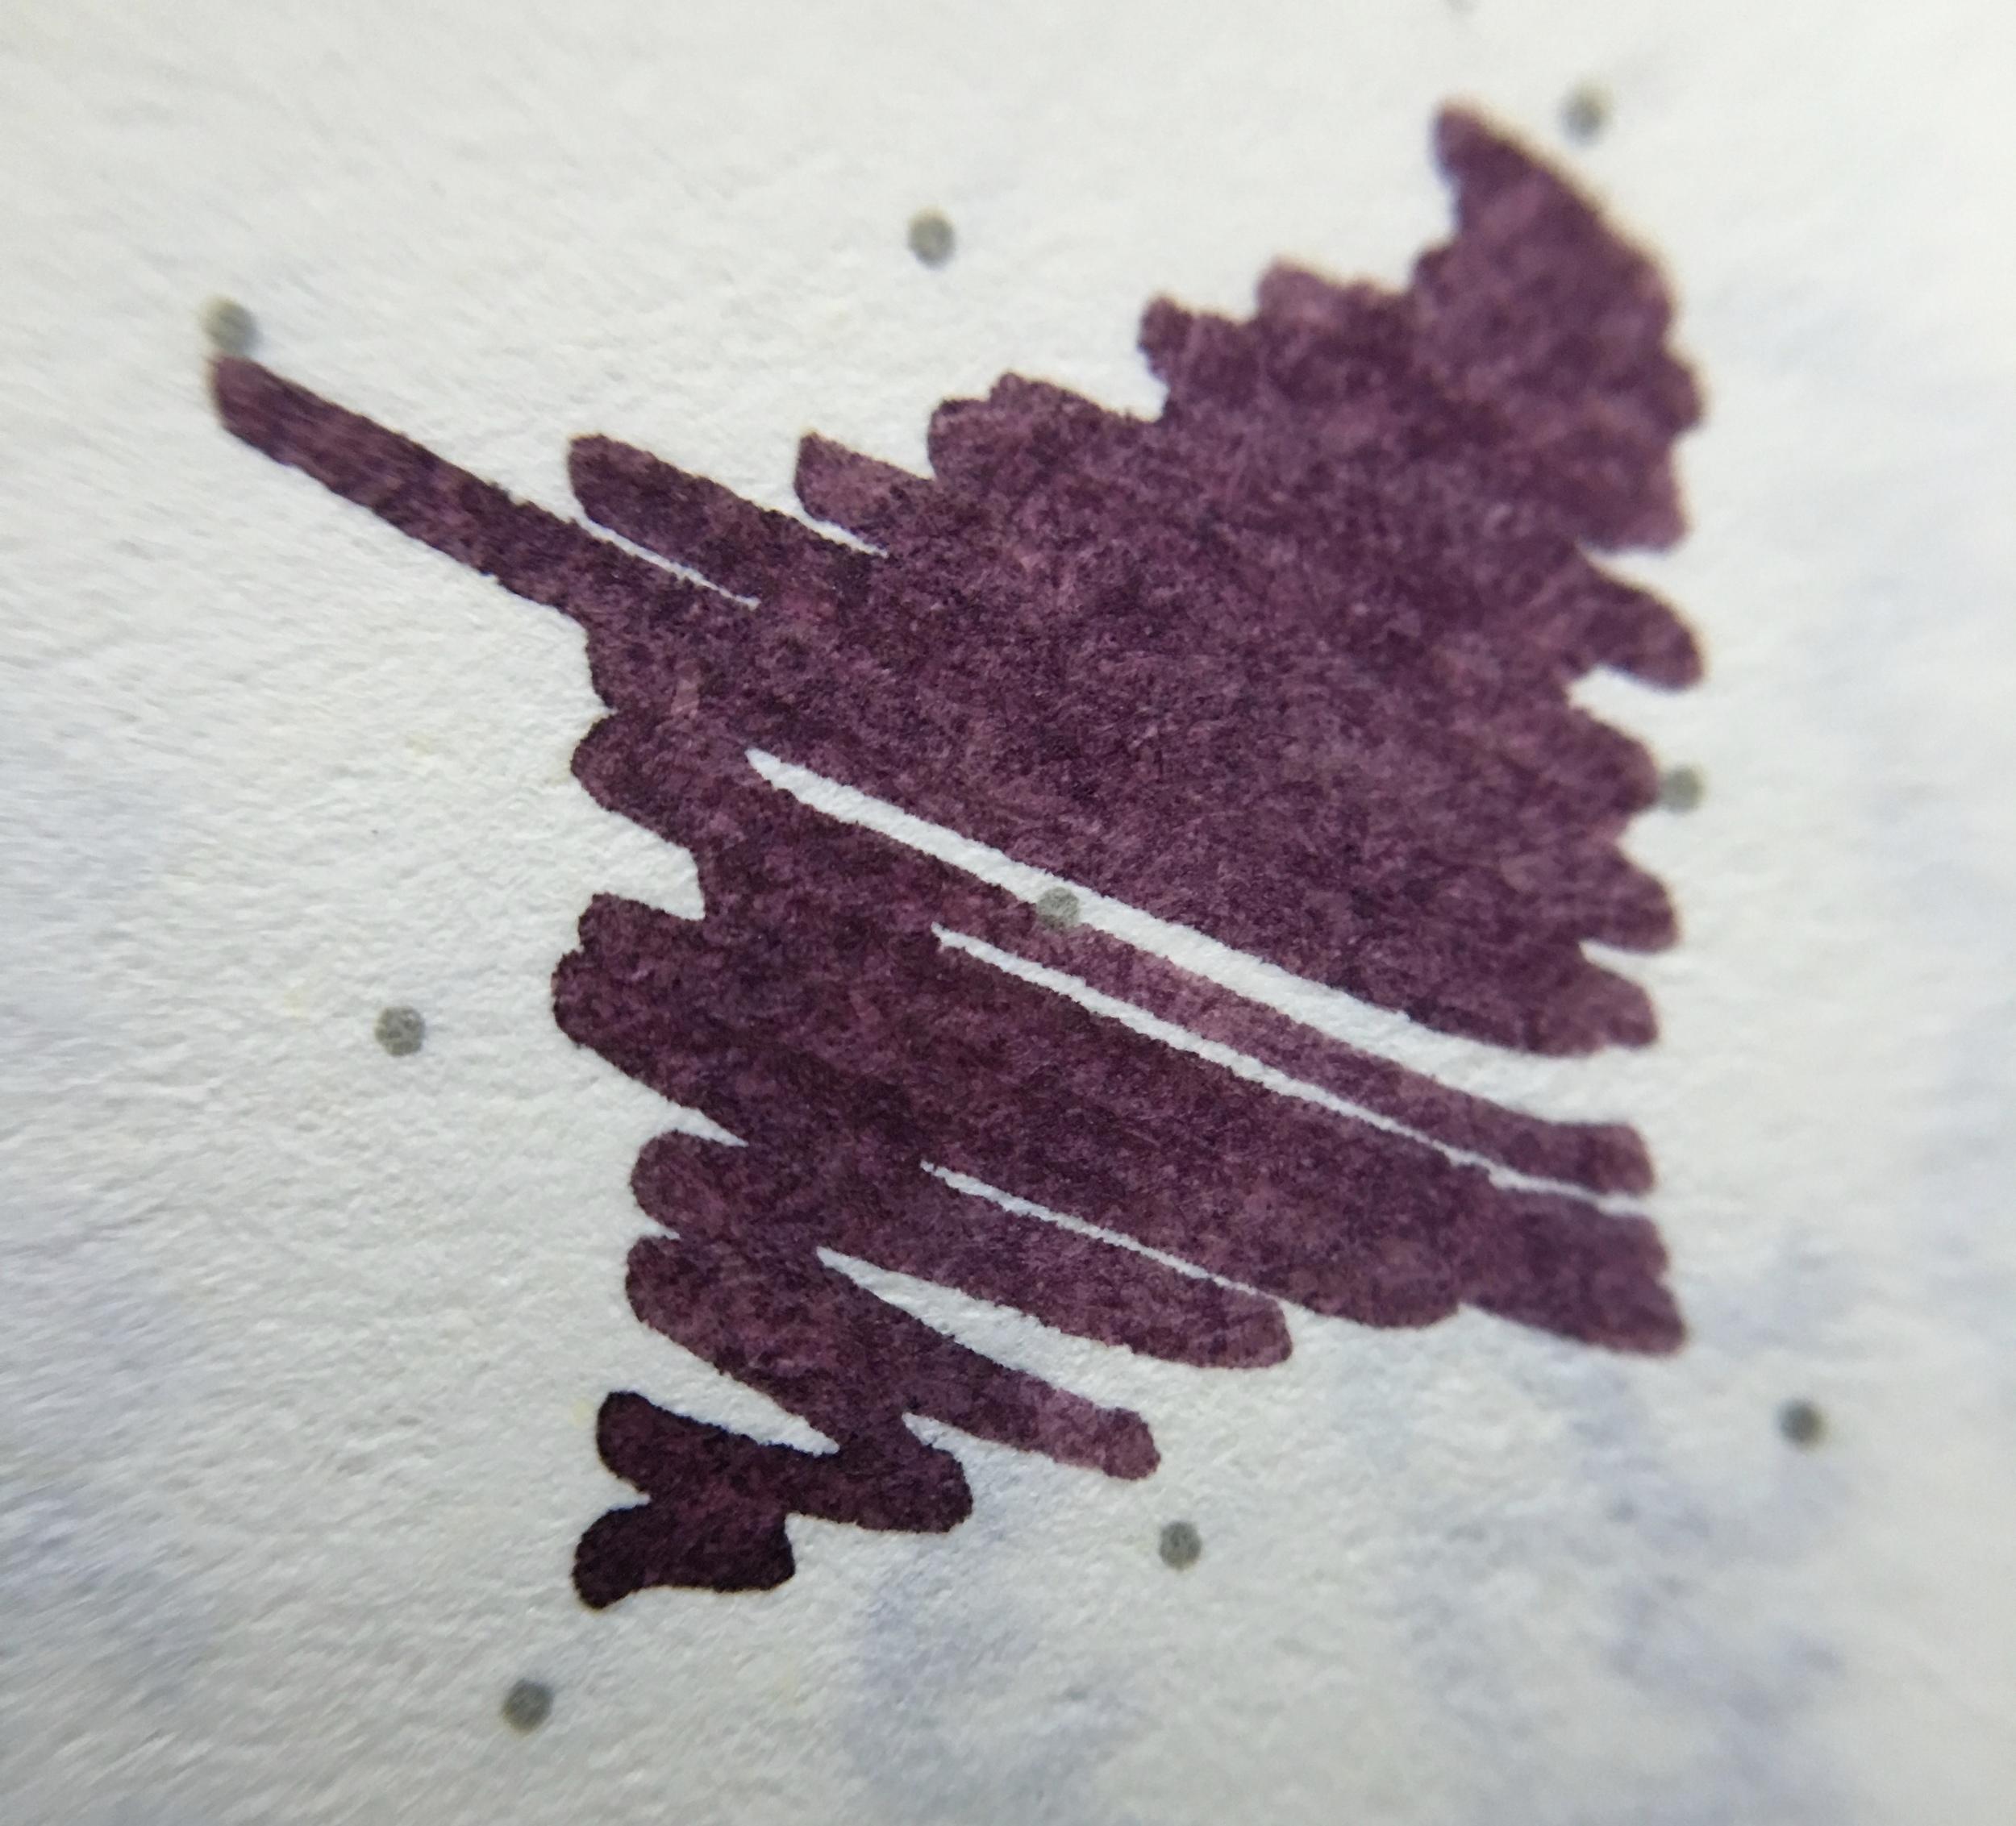 A macro shot of KWZ Brown Pink on Leuchtturm dot grid paper.